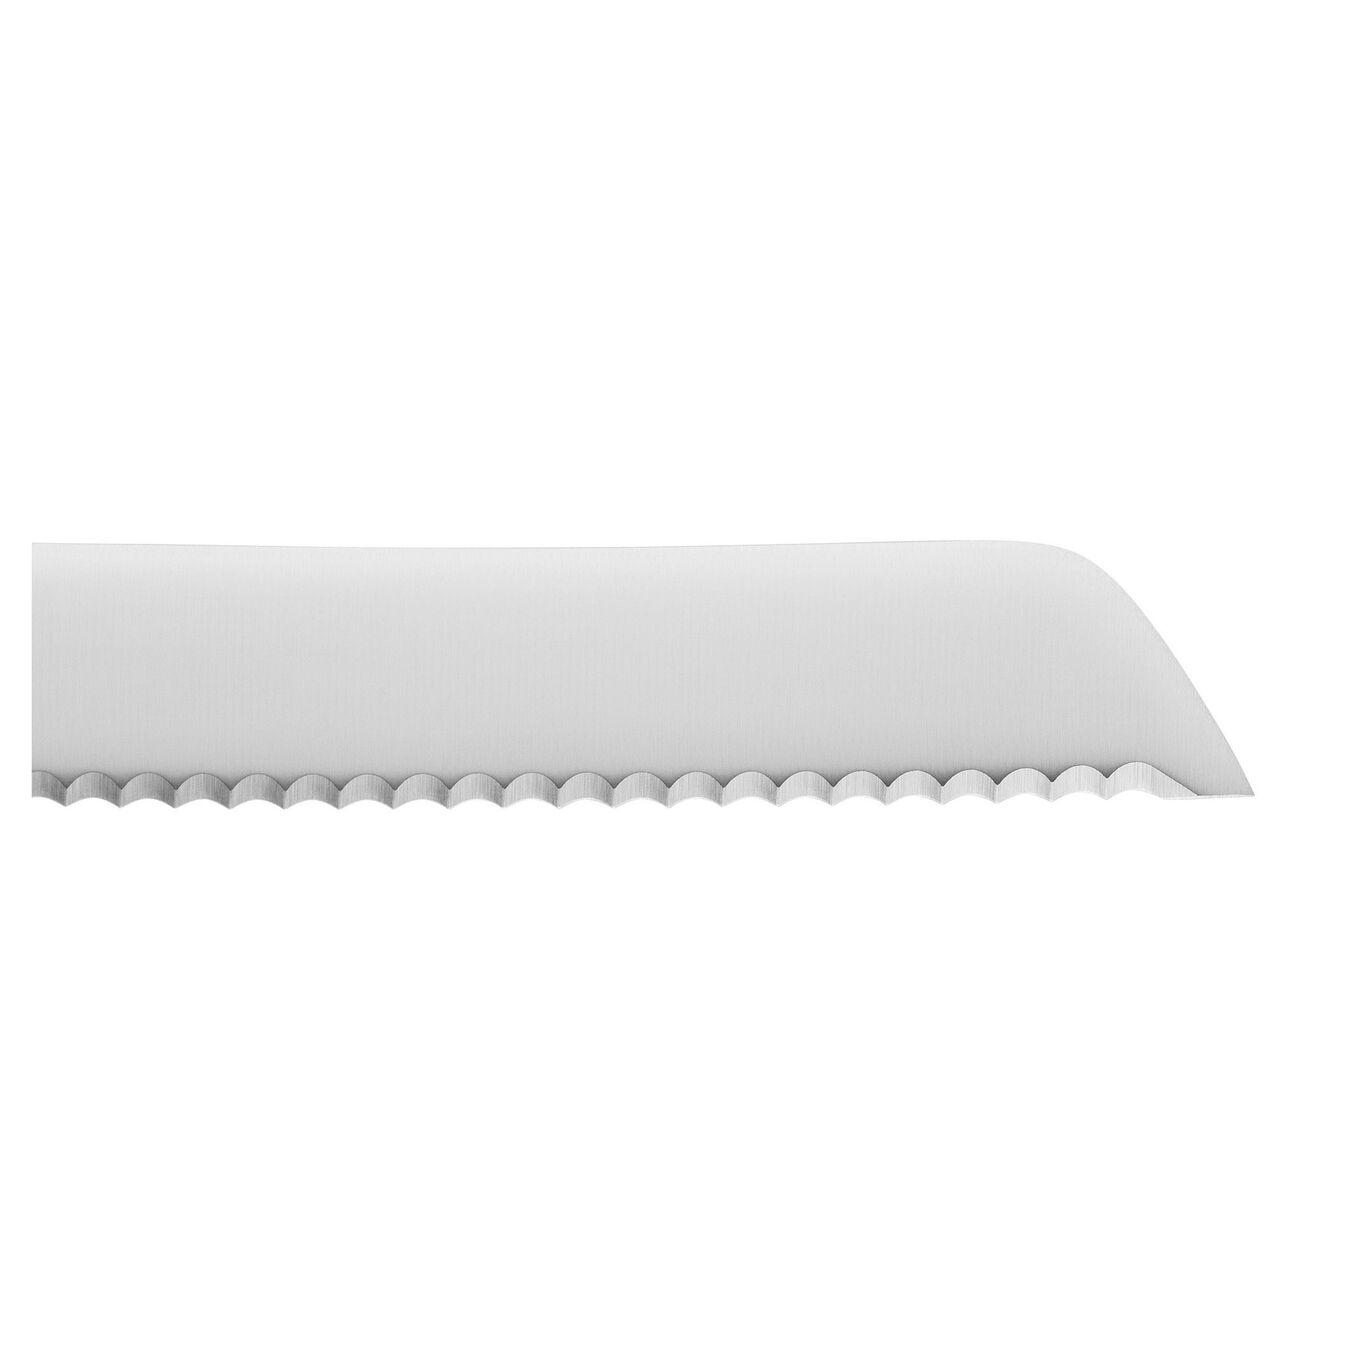 Brotmesser 20 cm, (keine spezielle Farbe), Kunststoff,,large 4